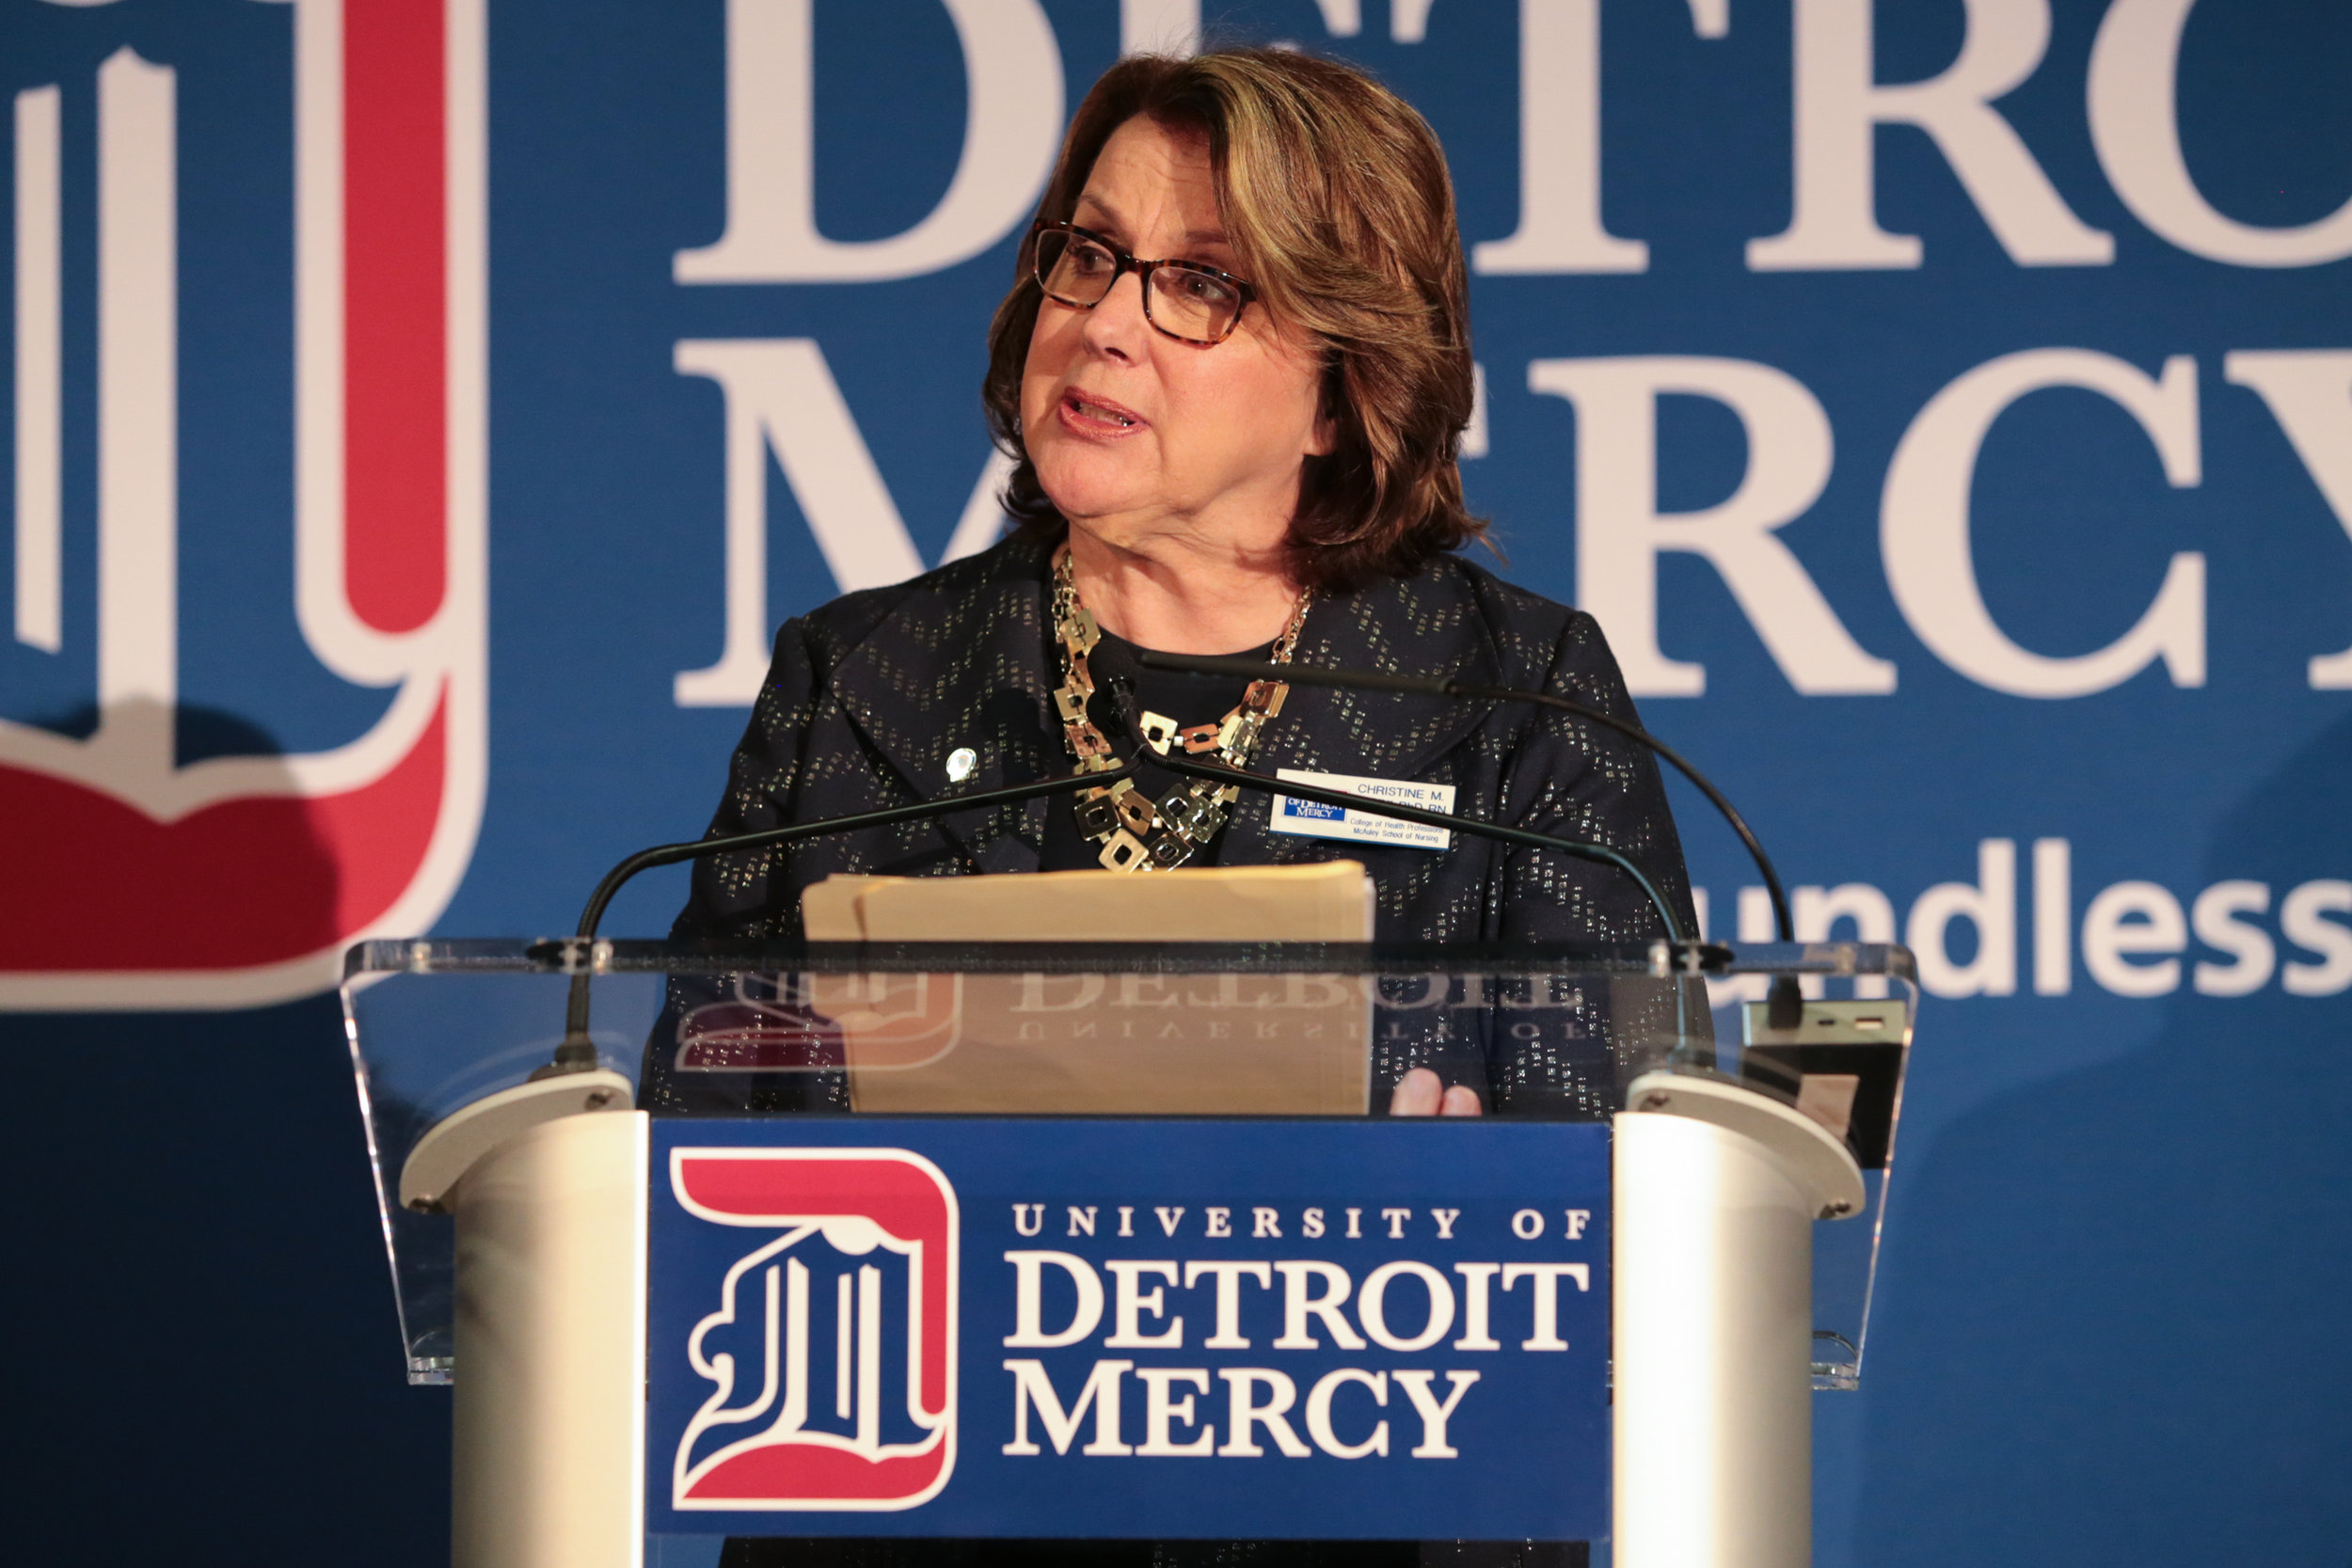 Christine Pacini speaking at the University of Detroit Mercy's annual Spirit Awards ceremony (Photo by University of Detroit Mercy)